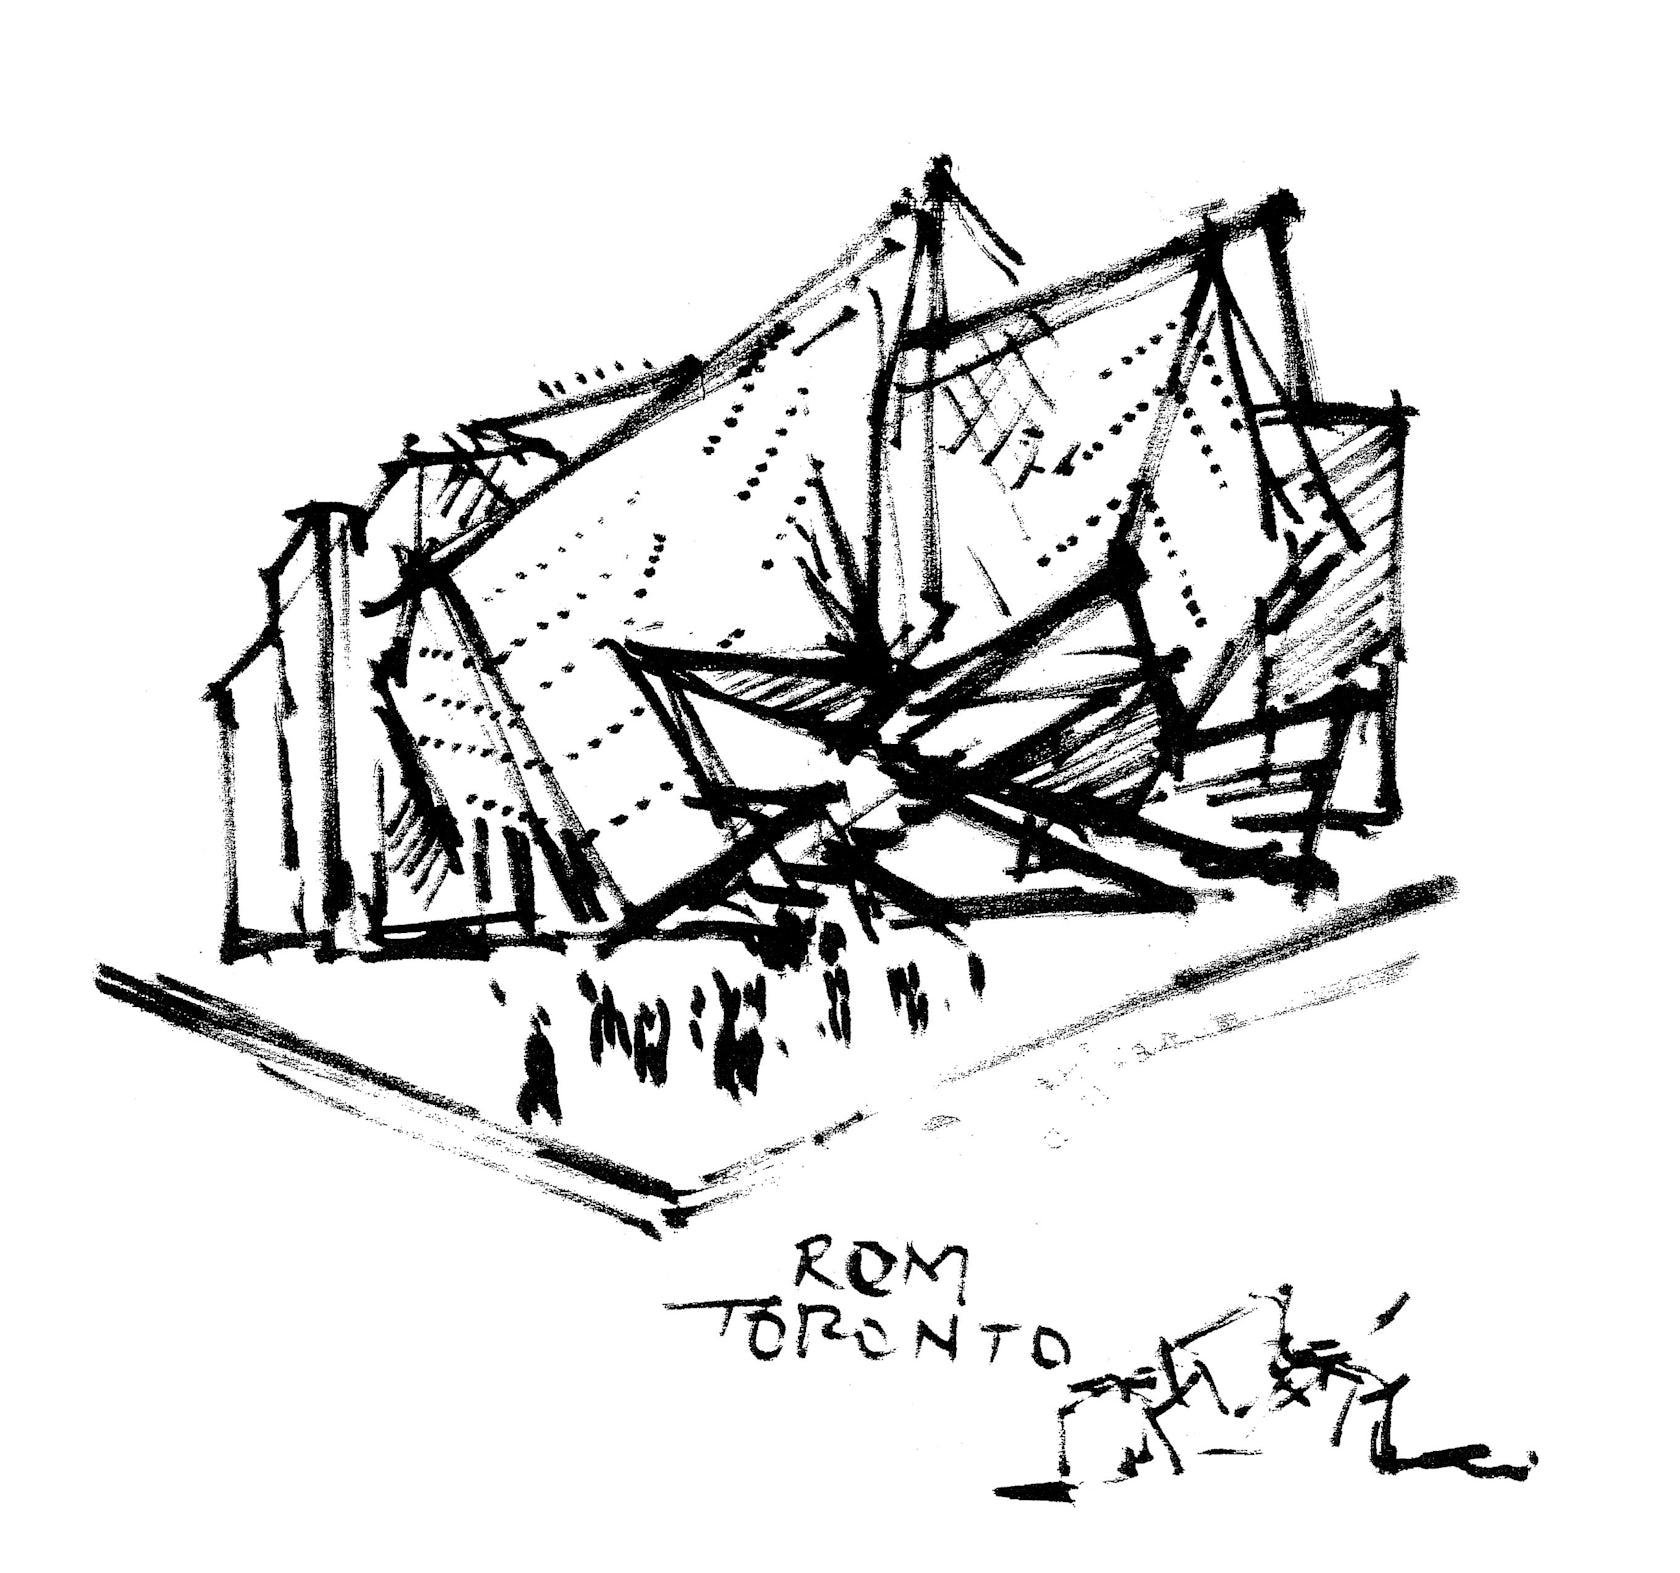 Royal ontario museum architizer for Denver art museum concept